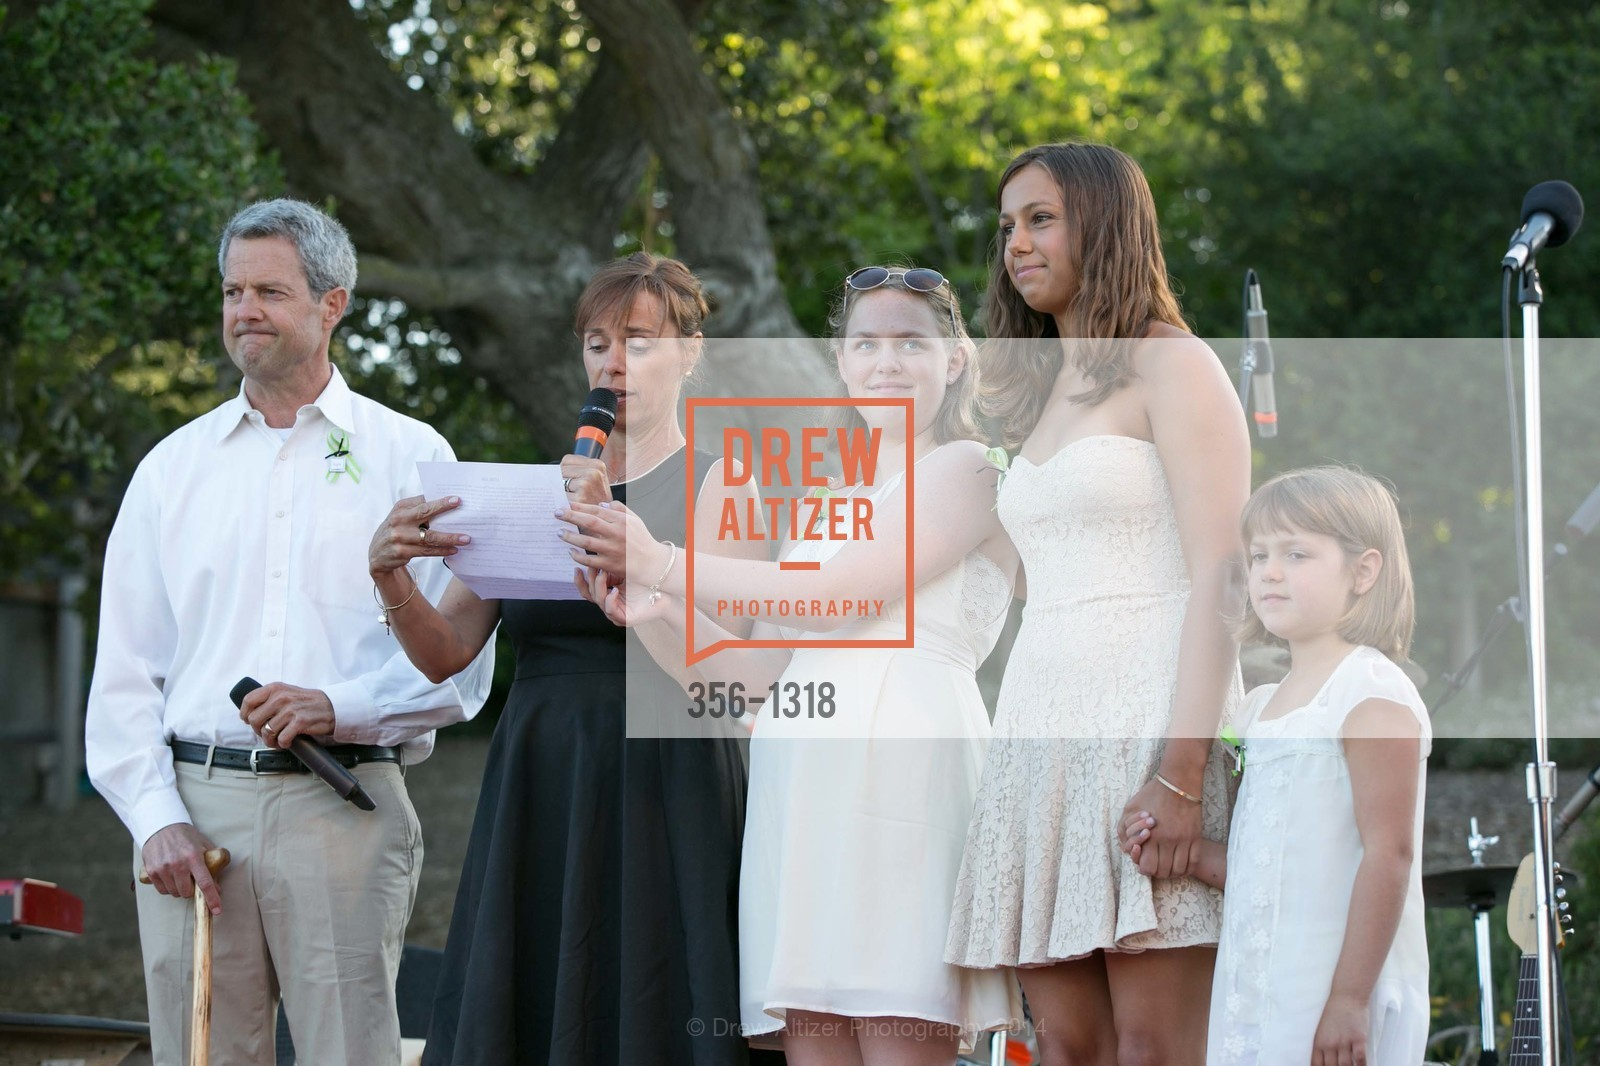 Scott Athearn, Camille Athearn, Isabel Athearn, Bronte Athearn, Abby Athearn, Photo #356-1318